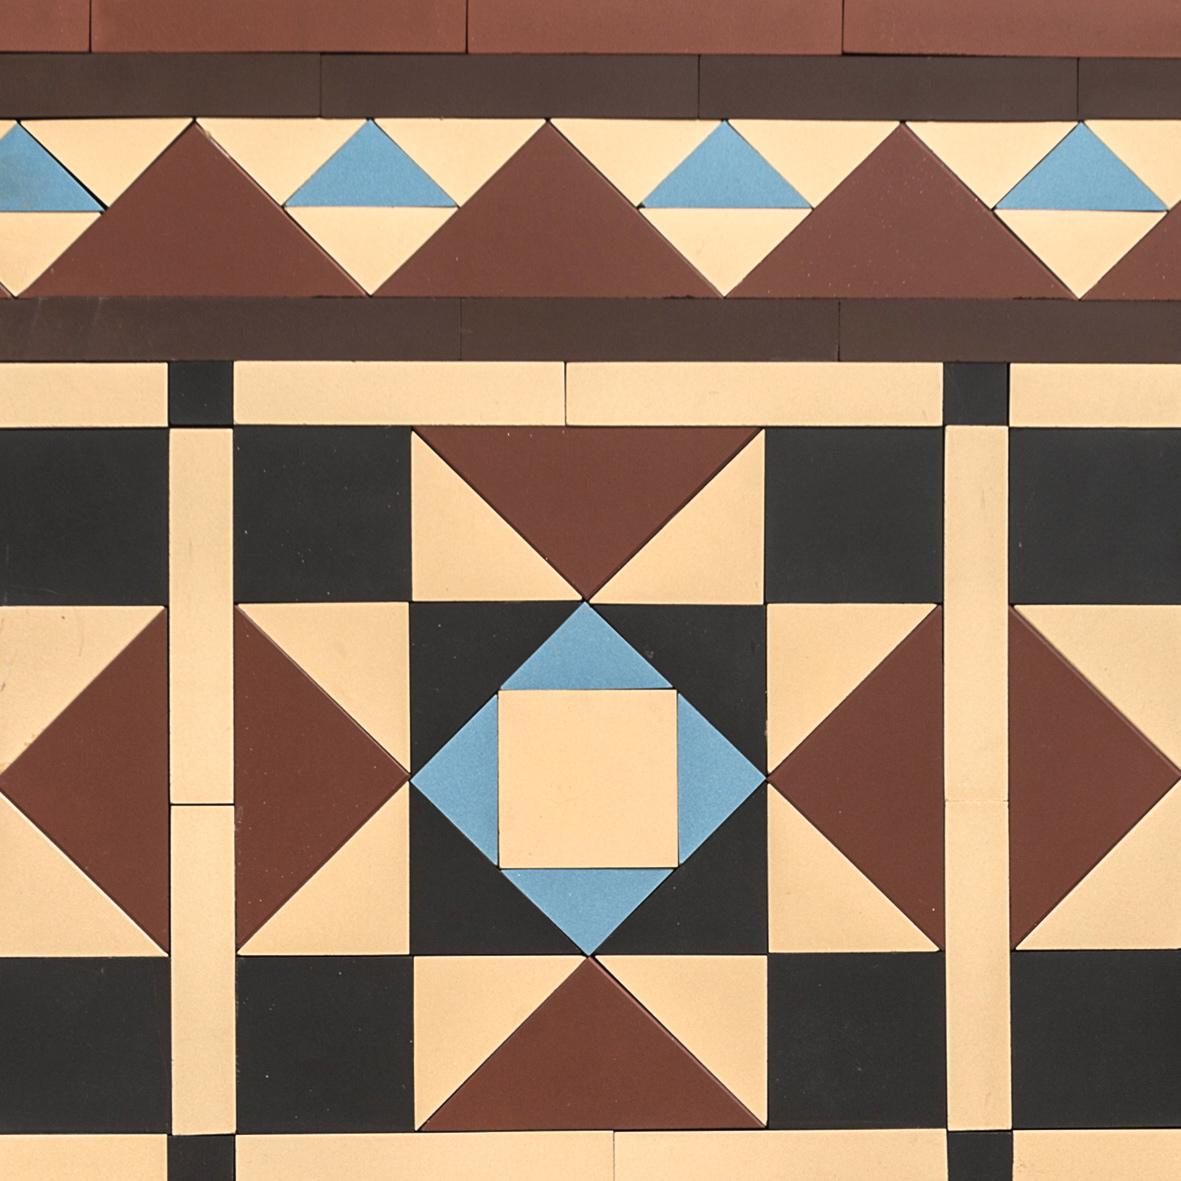 Pattern Classic Sussex Continuous Design Eco Tile Factory